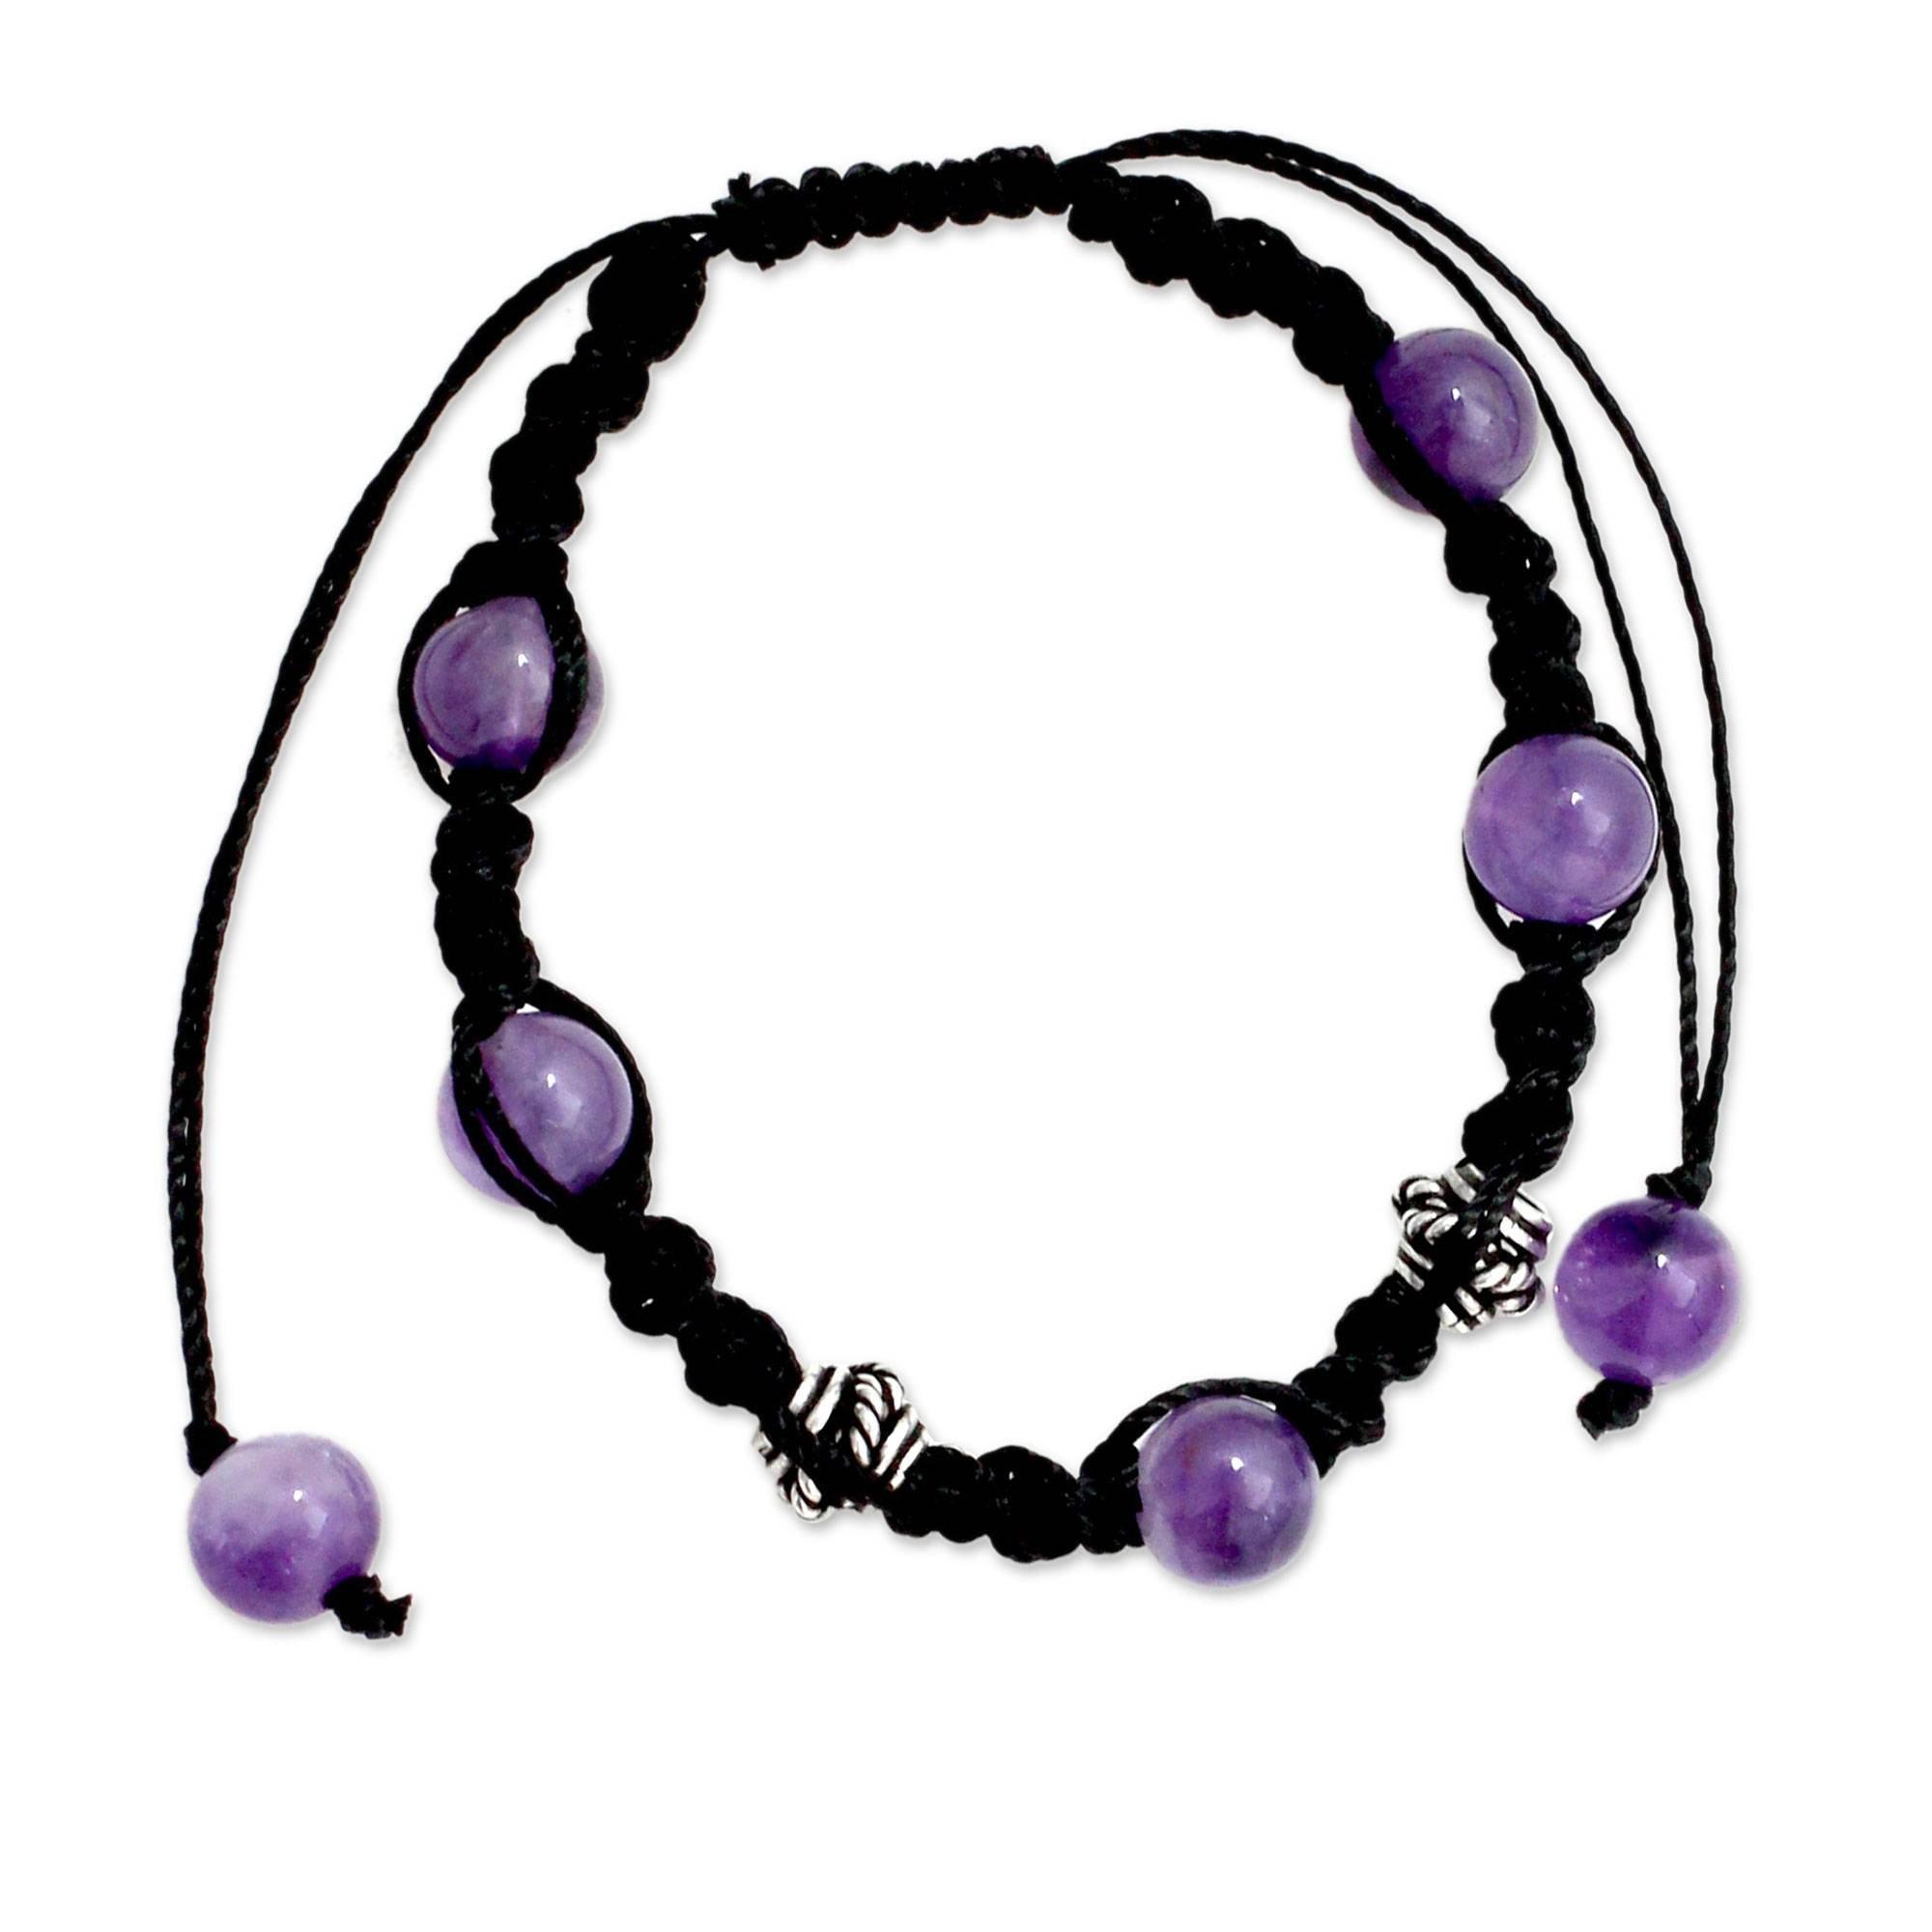 NOVICA Handmade Amethyst Shambhala Style Macrame Bracelet with Sterling Silver Accent 'Violet Peace'